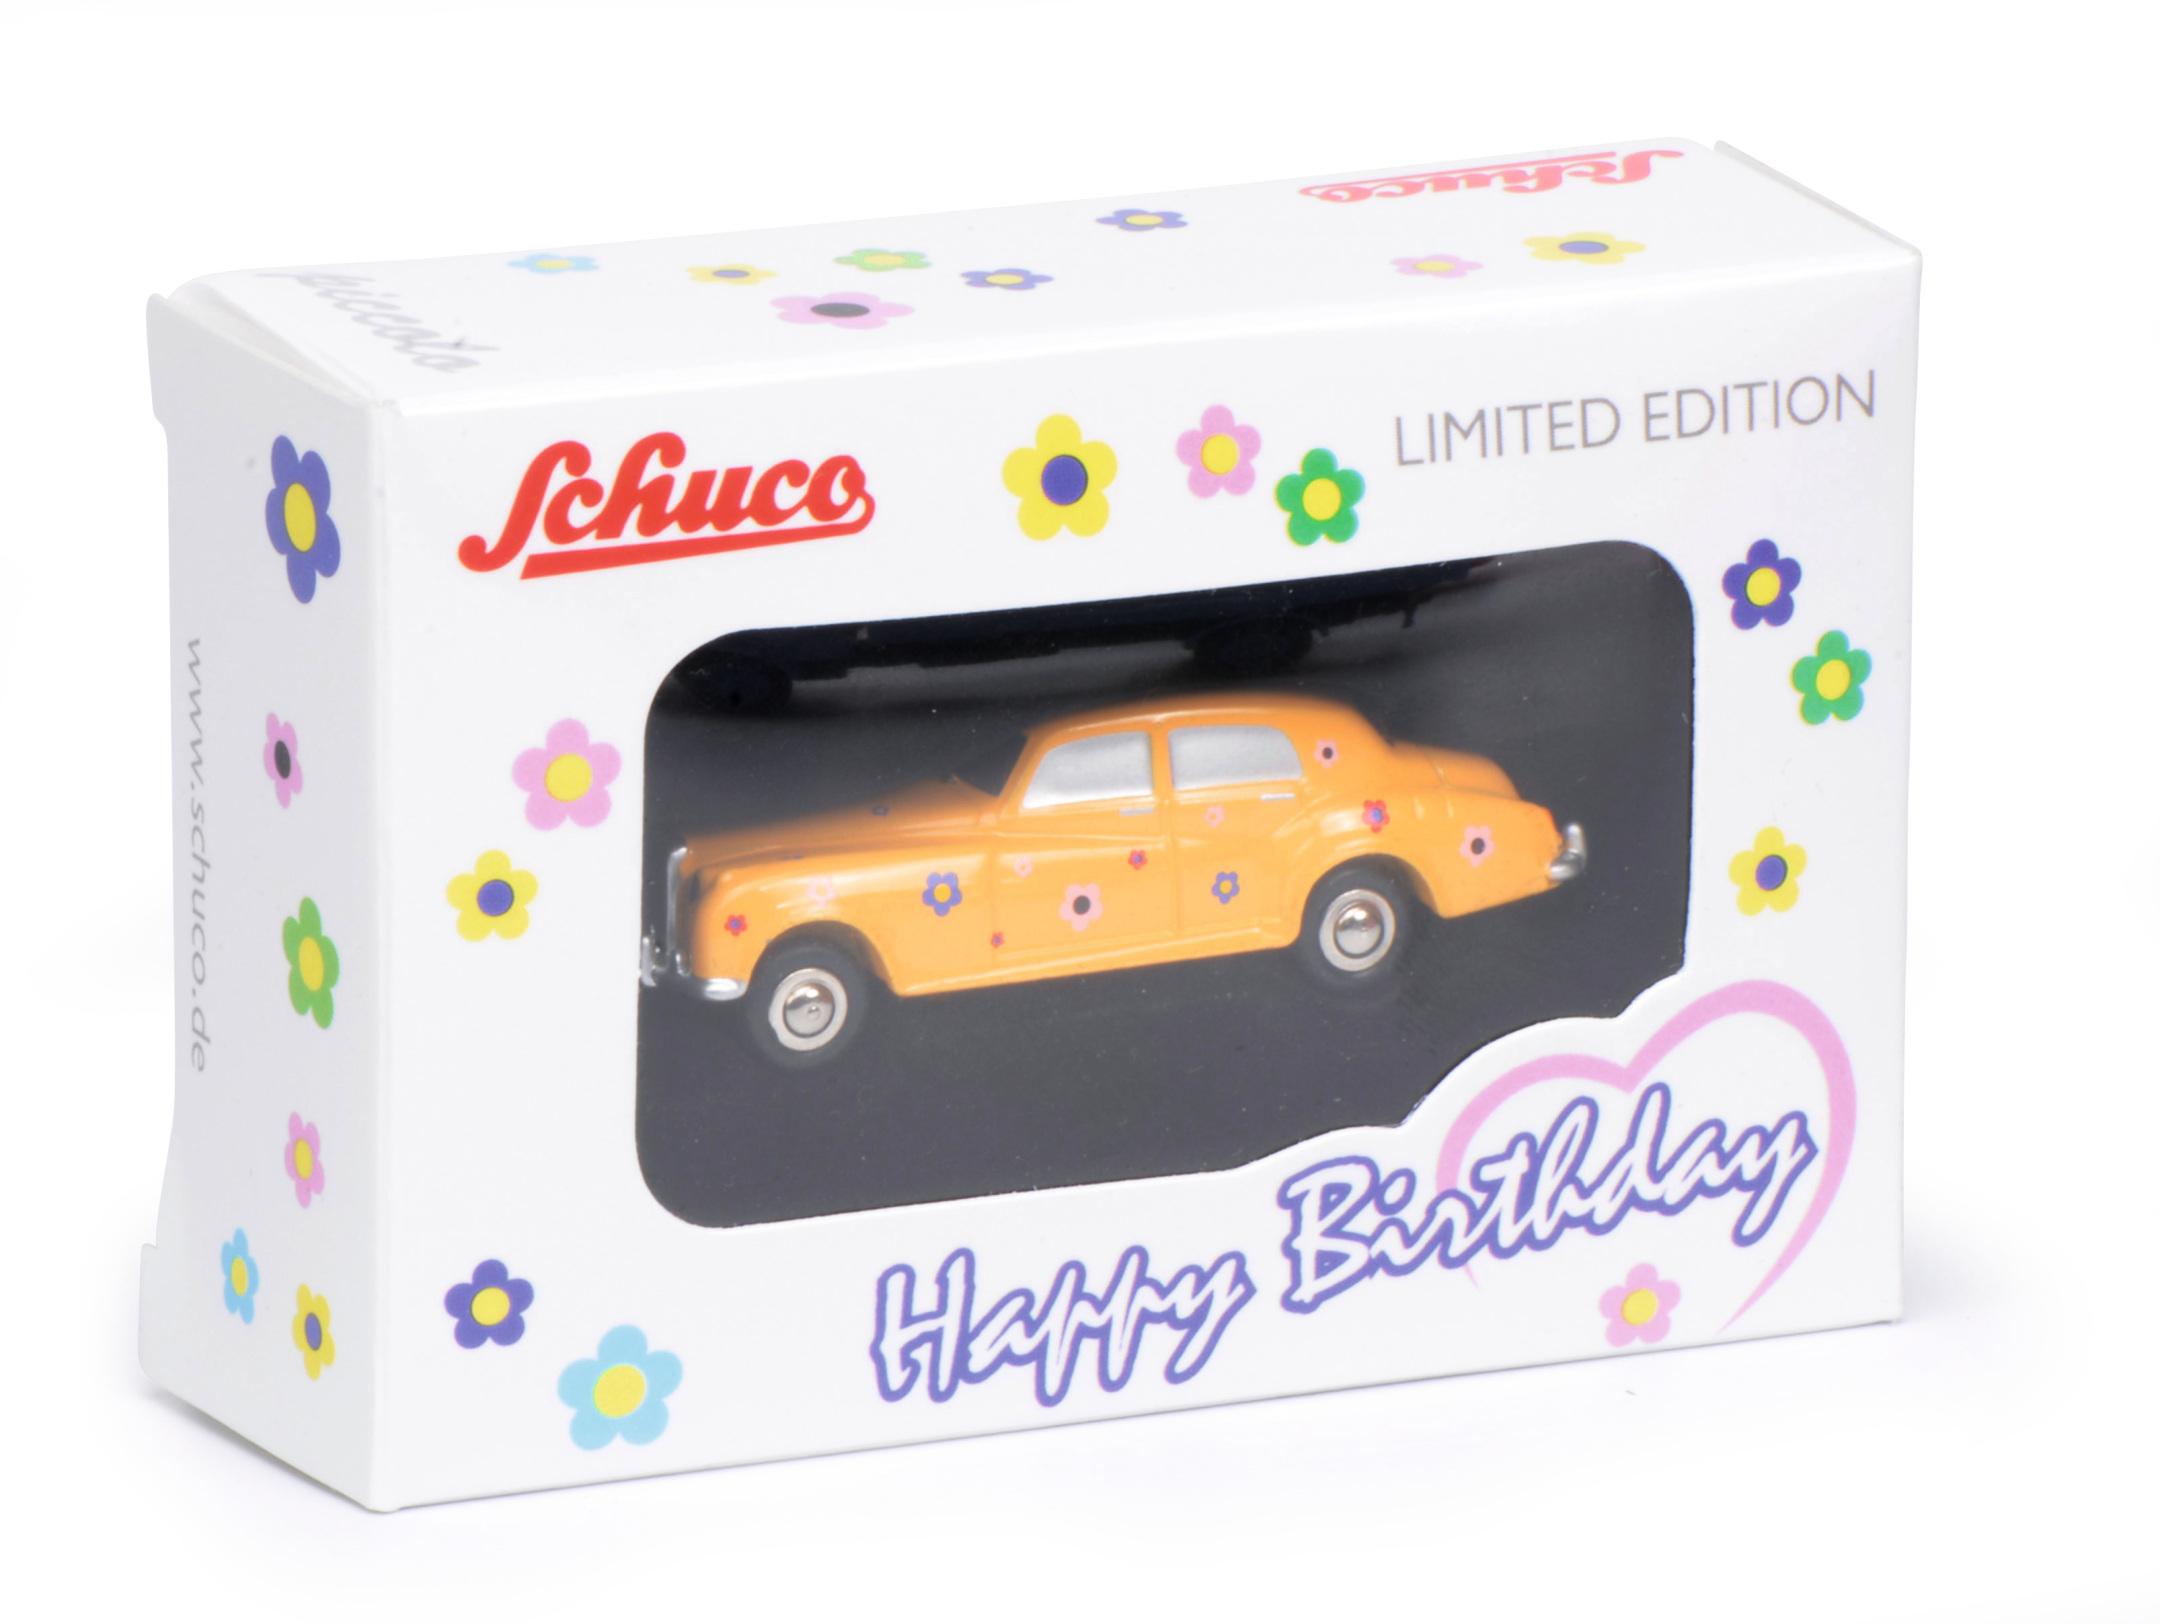 Piccolo Happy Birthday 2017